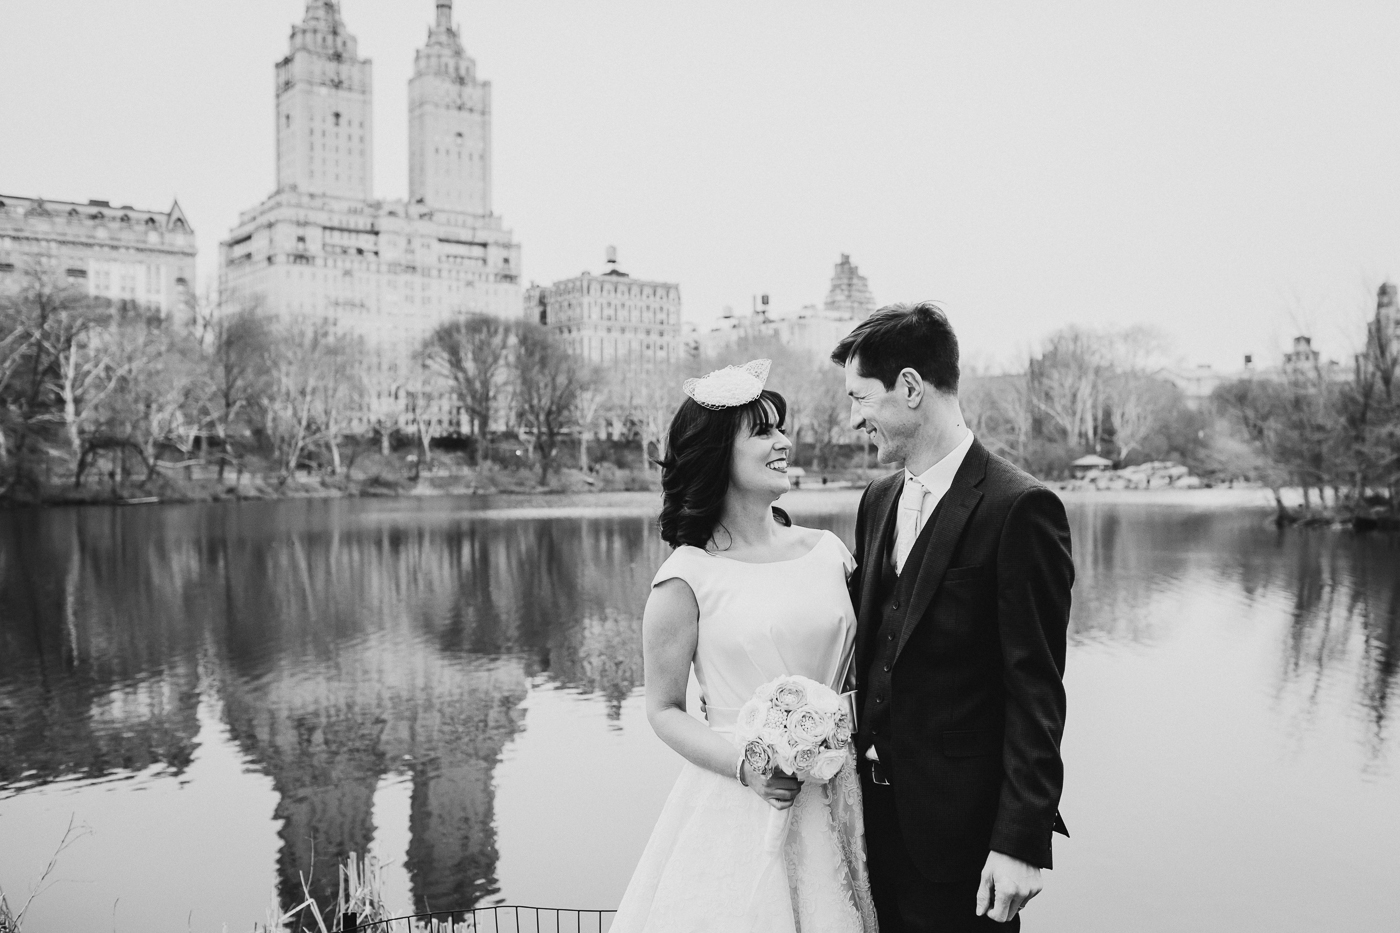 Ladies-Pavilion-Central-Park-NYC-Documentary-Elopement-Wedding-Photographer-50.jpg